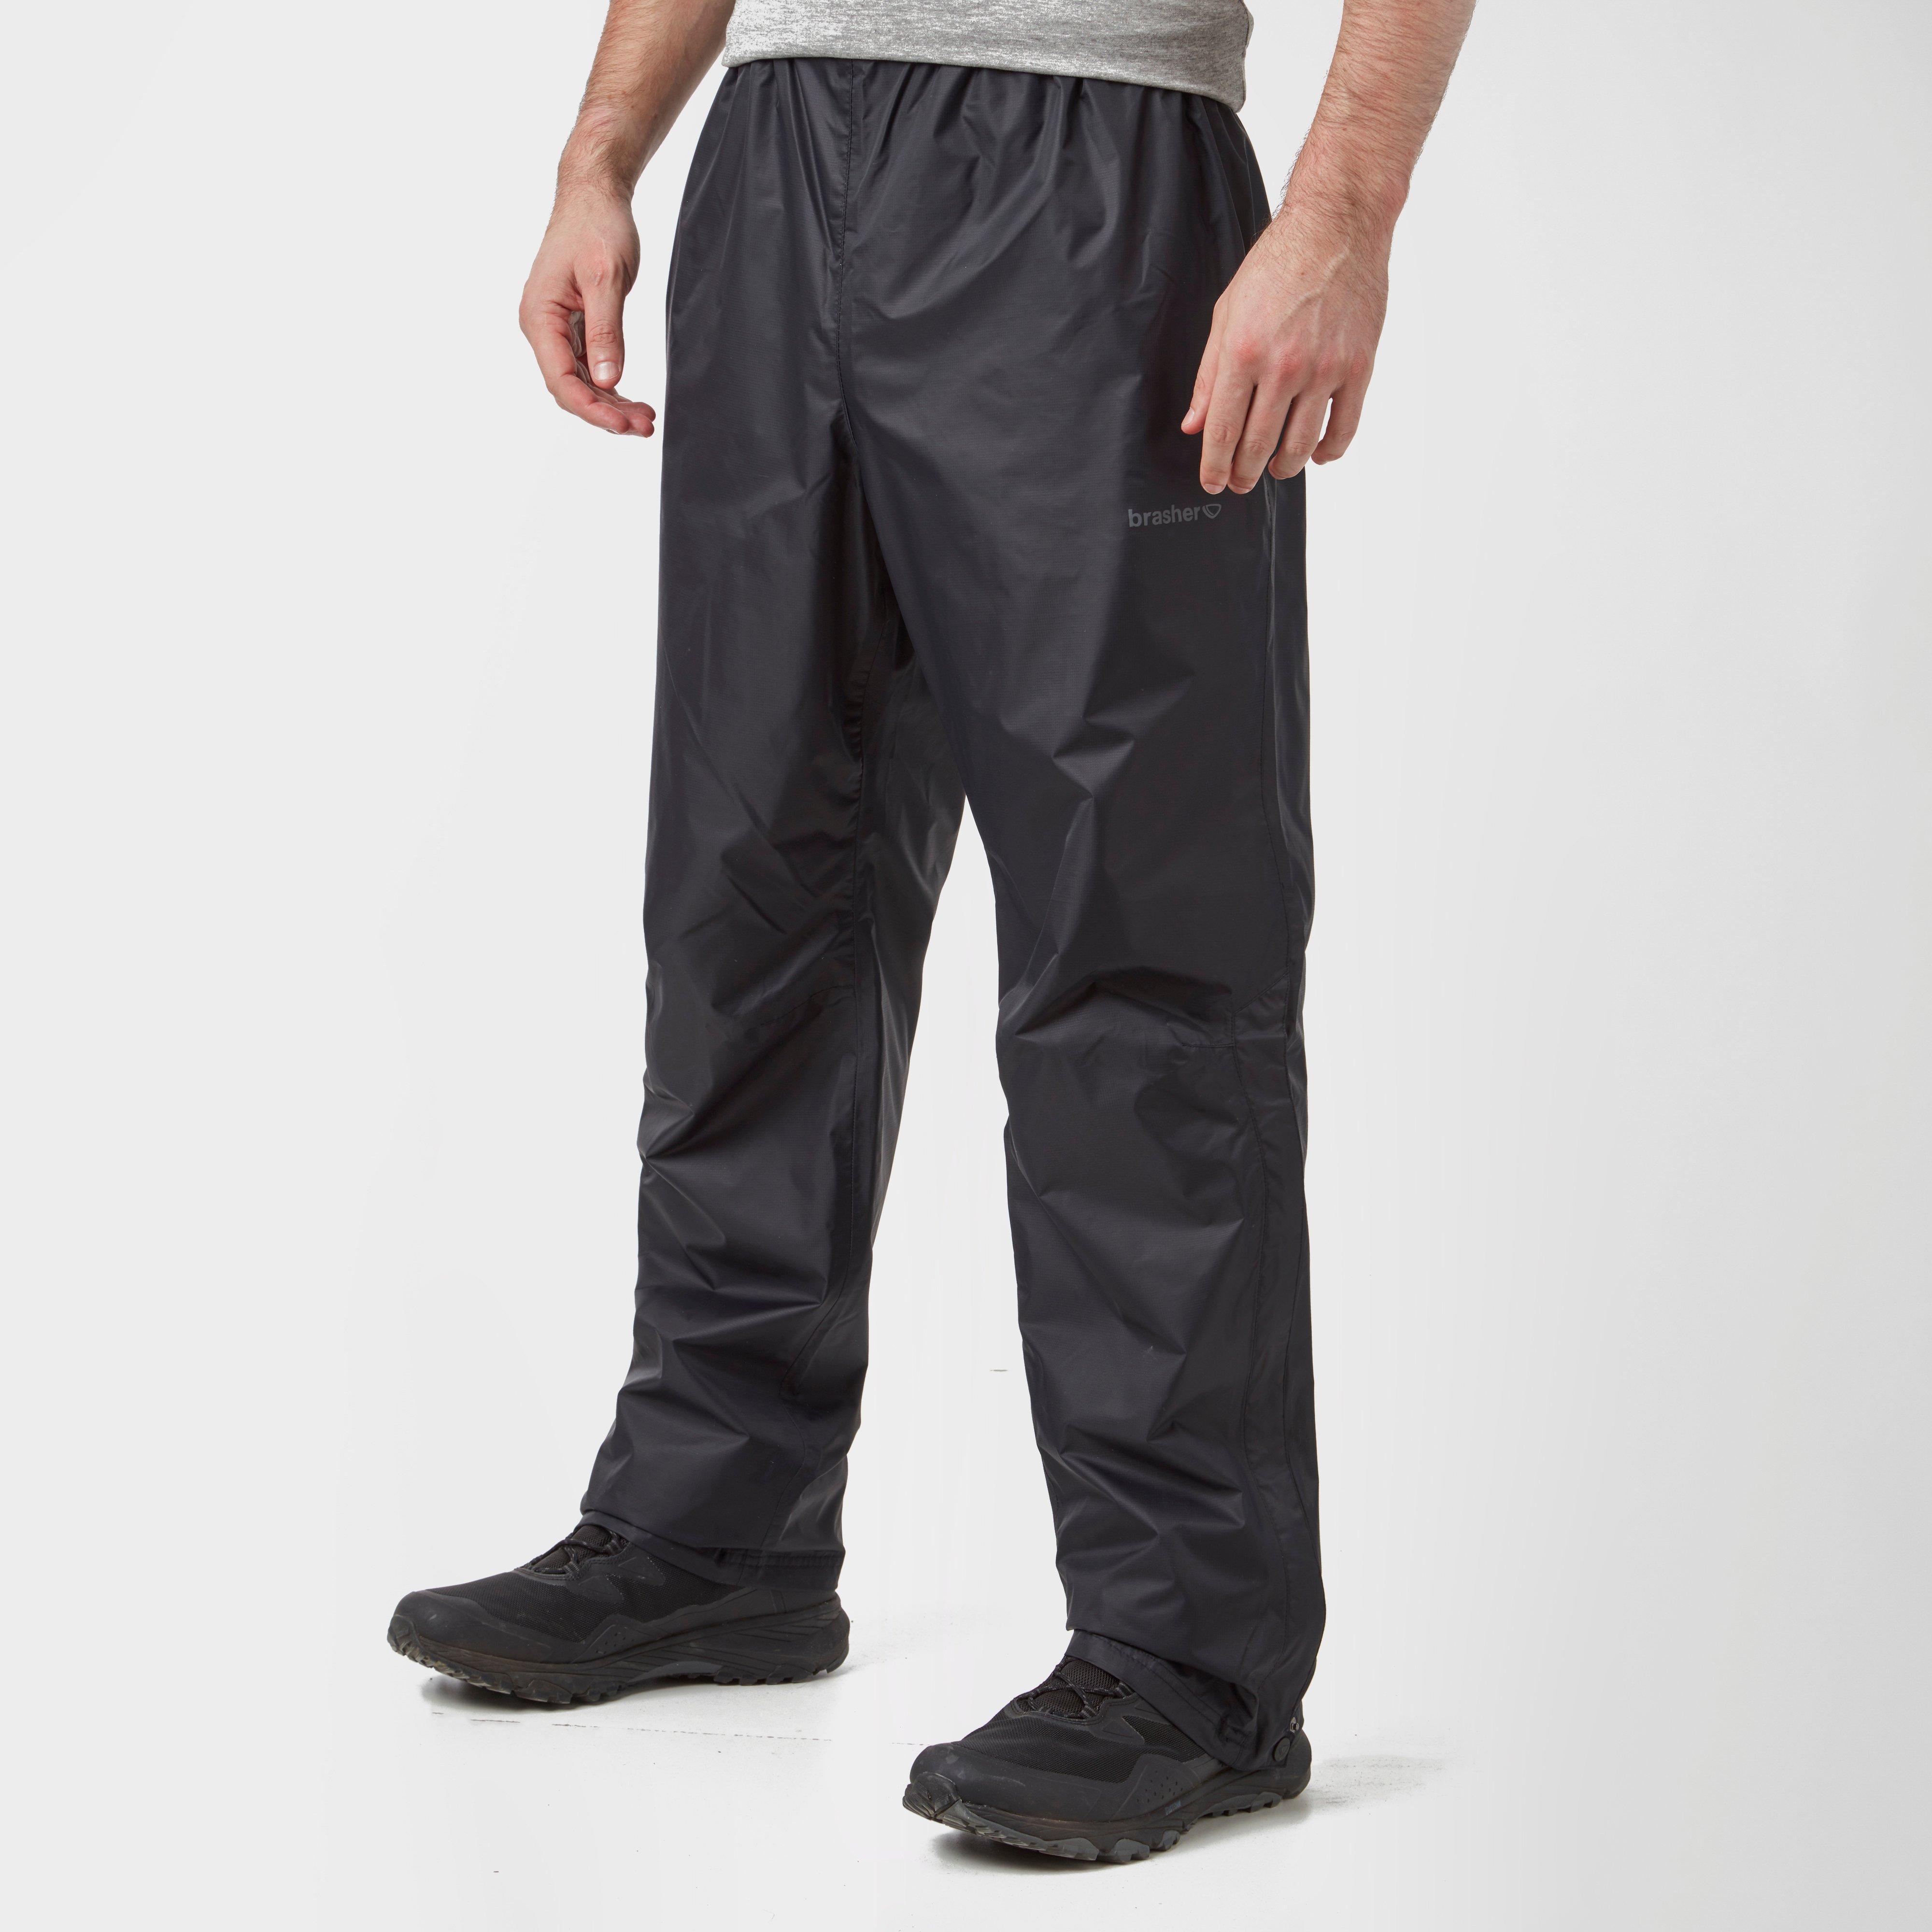 Brasher Brasher Mens Waterproof Overtrousers - Black, Black